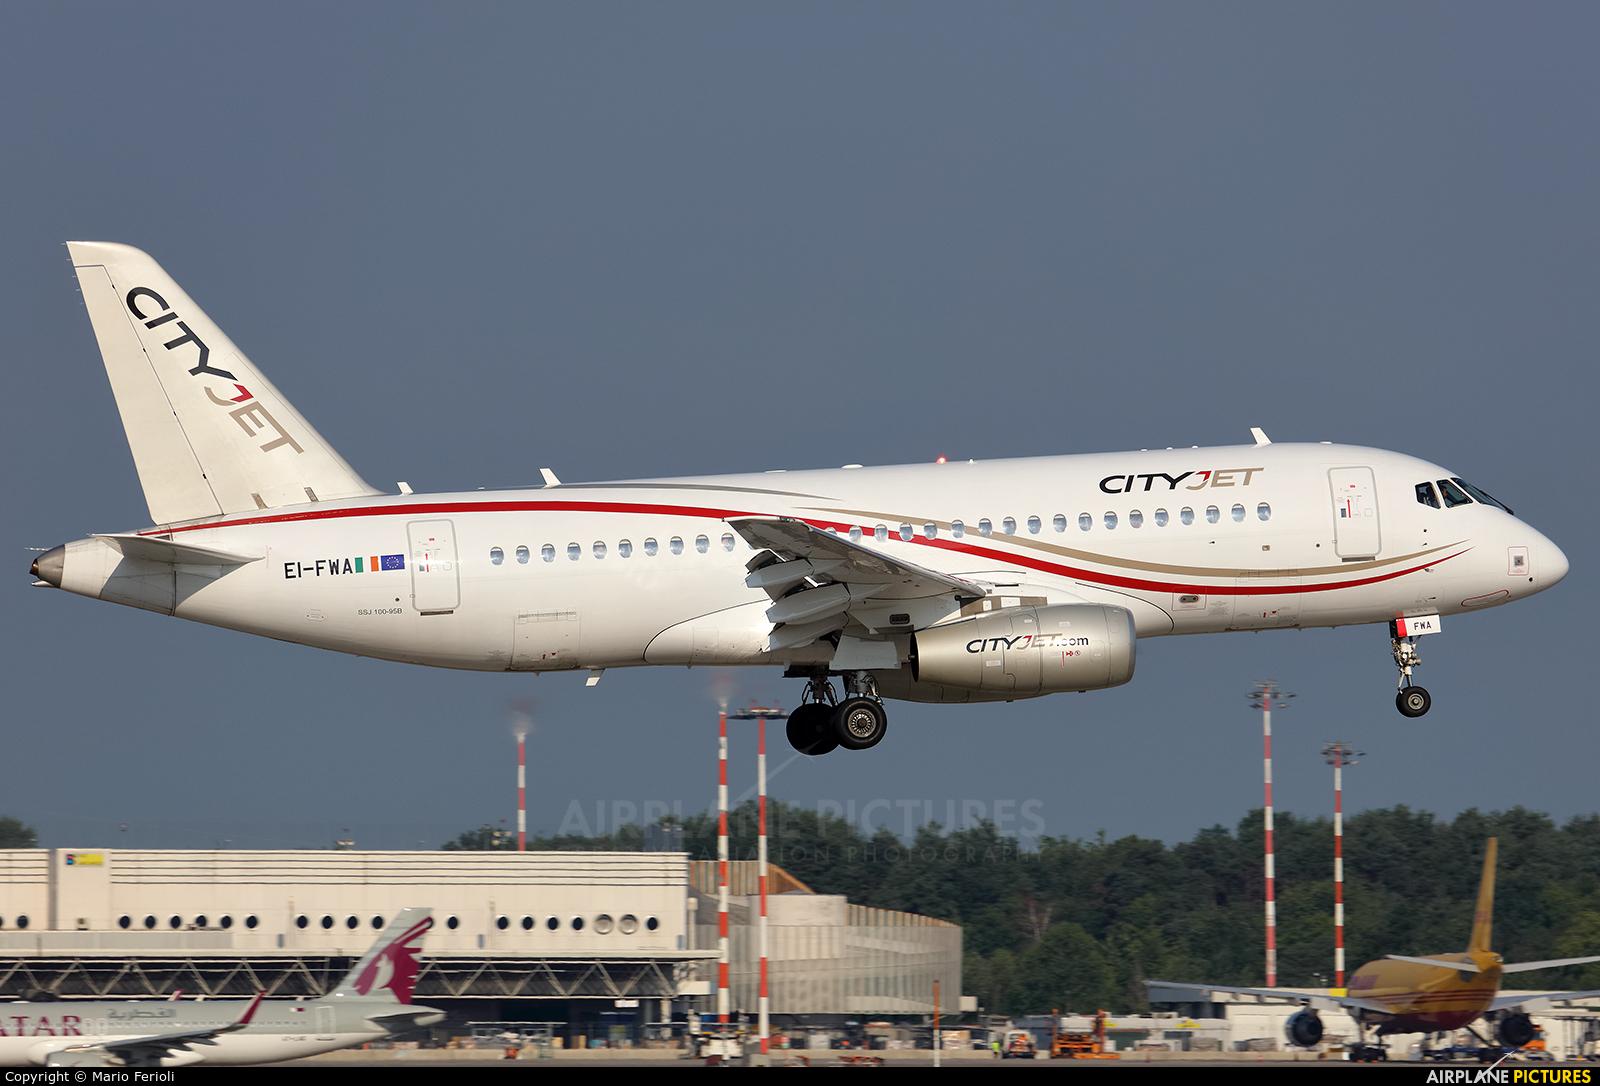 CityJet EI-FWA aircraft at Milan - Malpensa